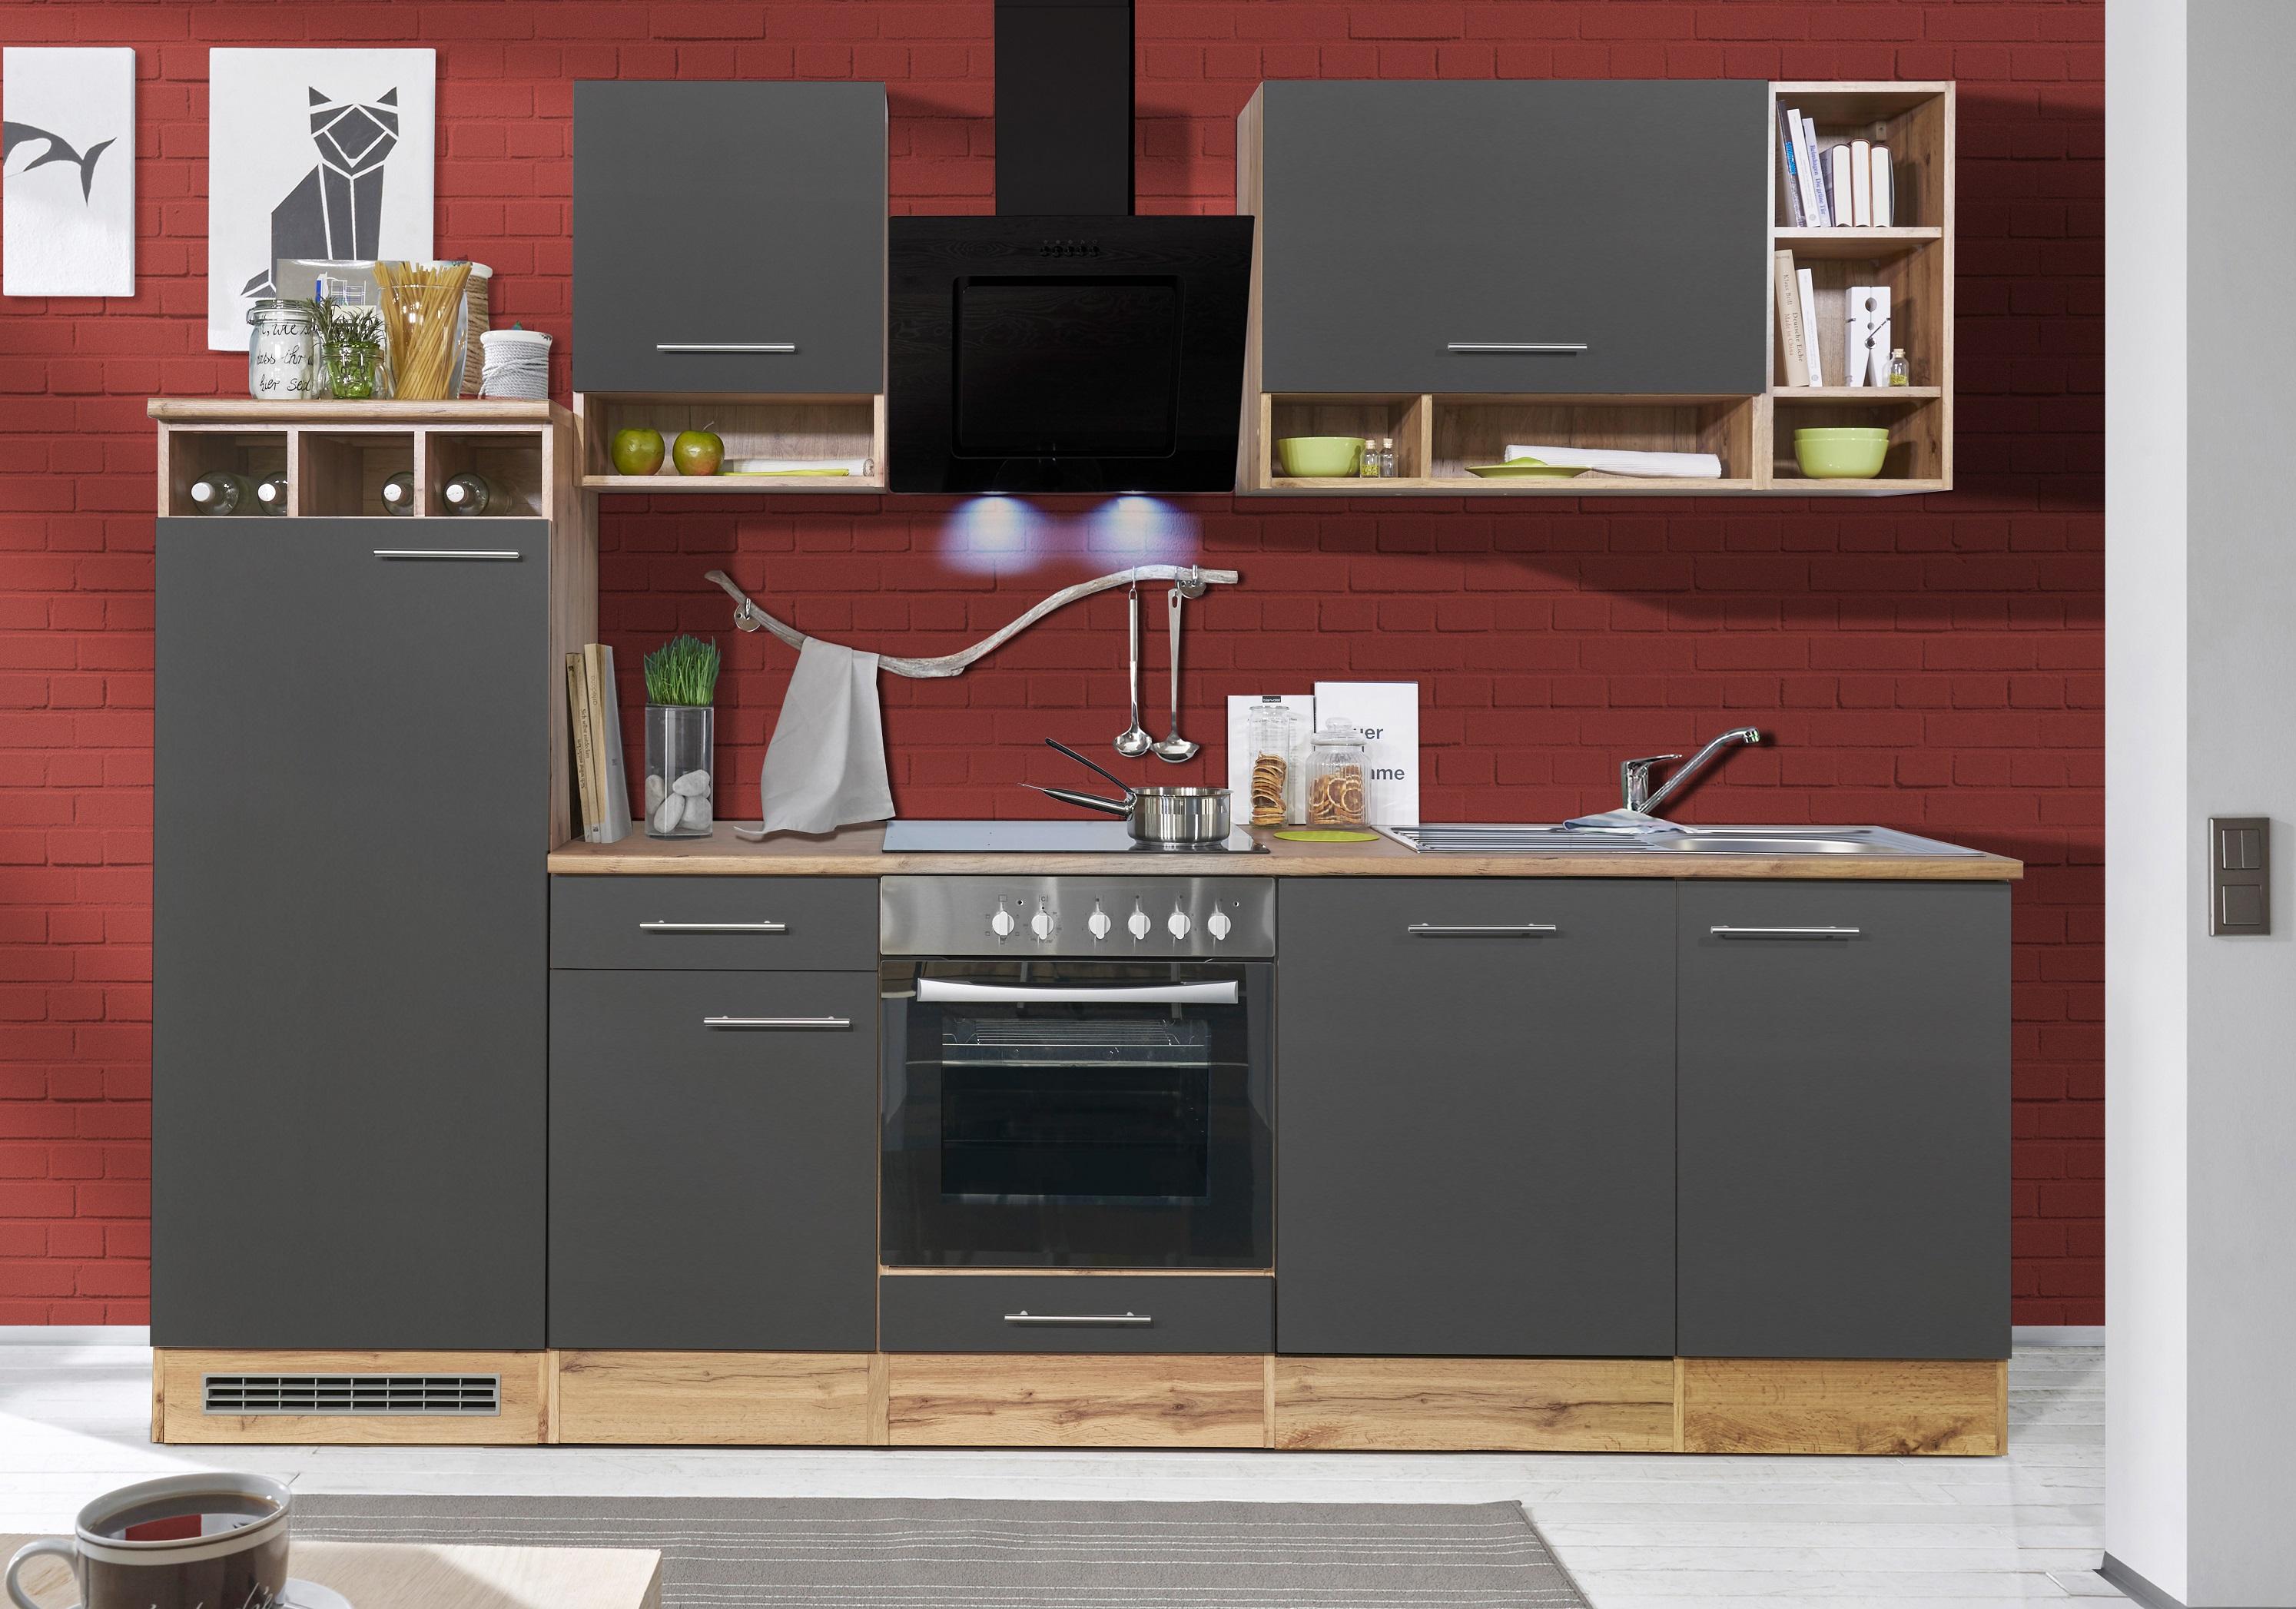 Moduli componibili Casa e cucina RESPEKTA cucina,angolo ...